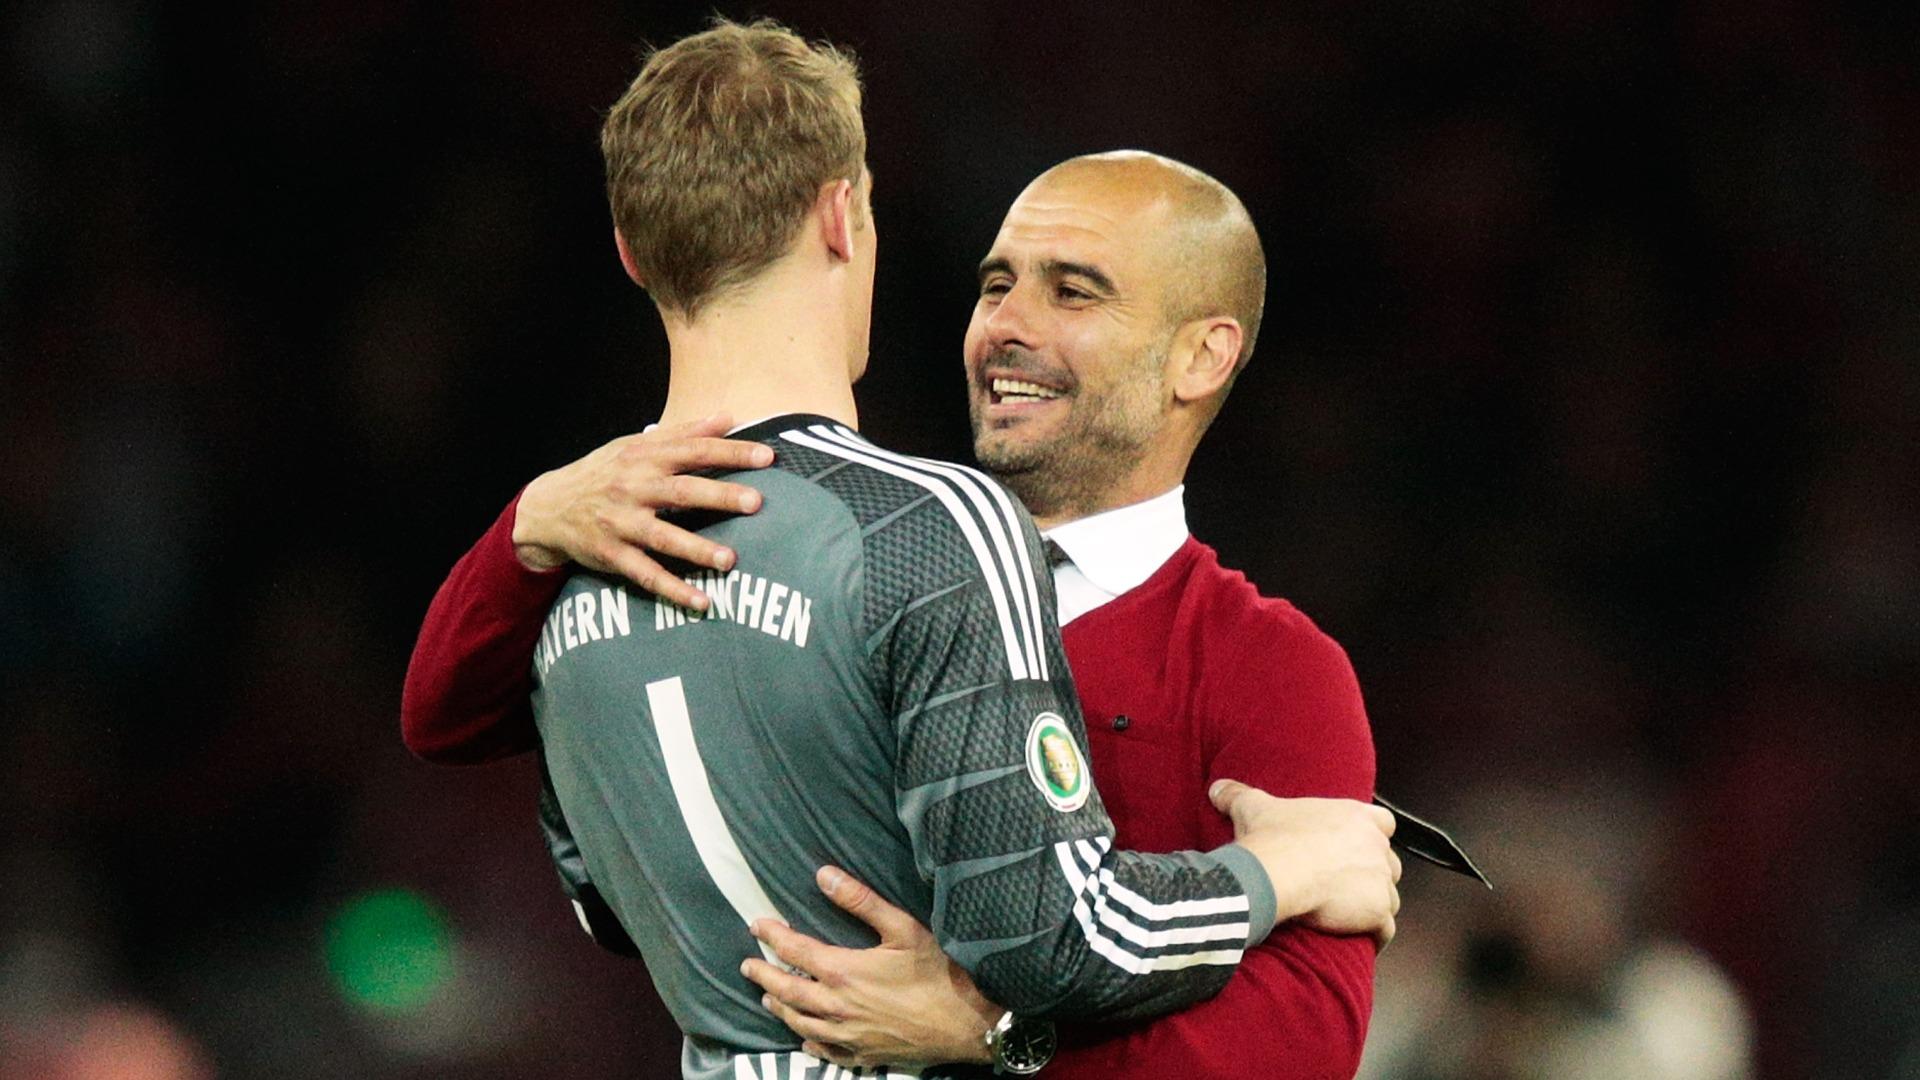 Bayern Munich 'going very well' under Flick amid Guardiola talk, says Neuer